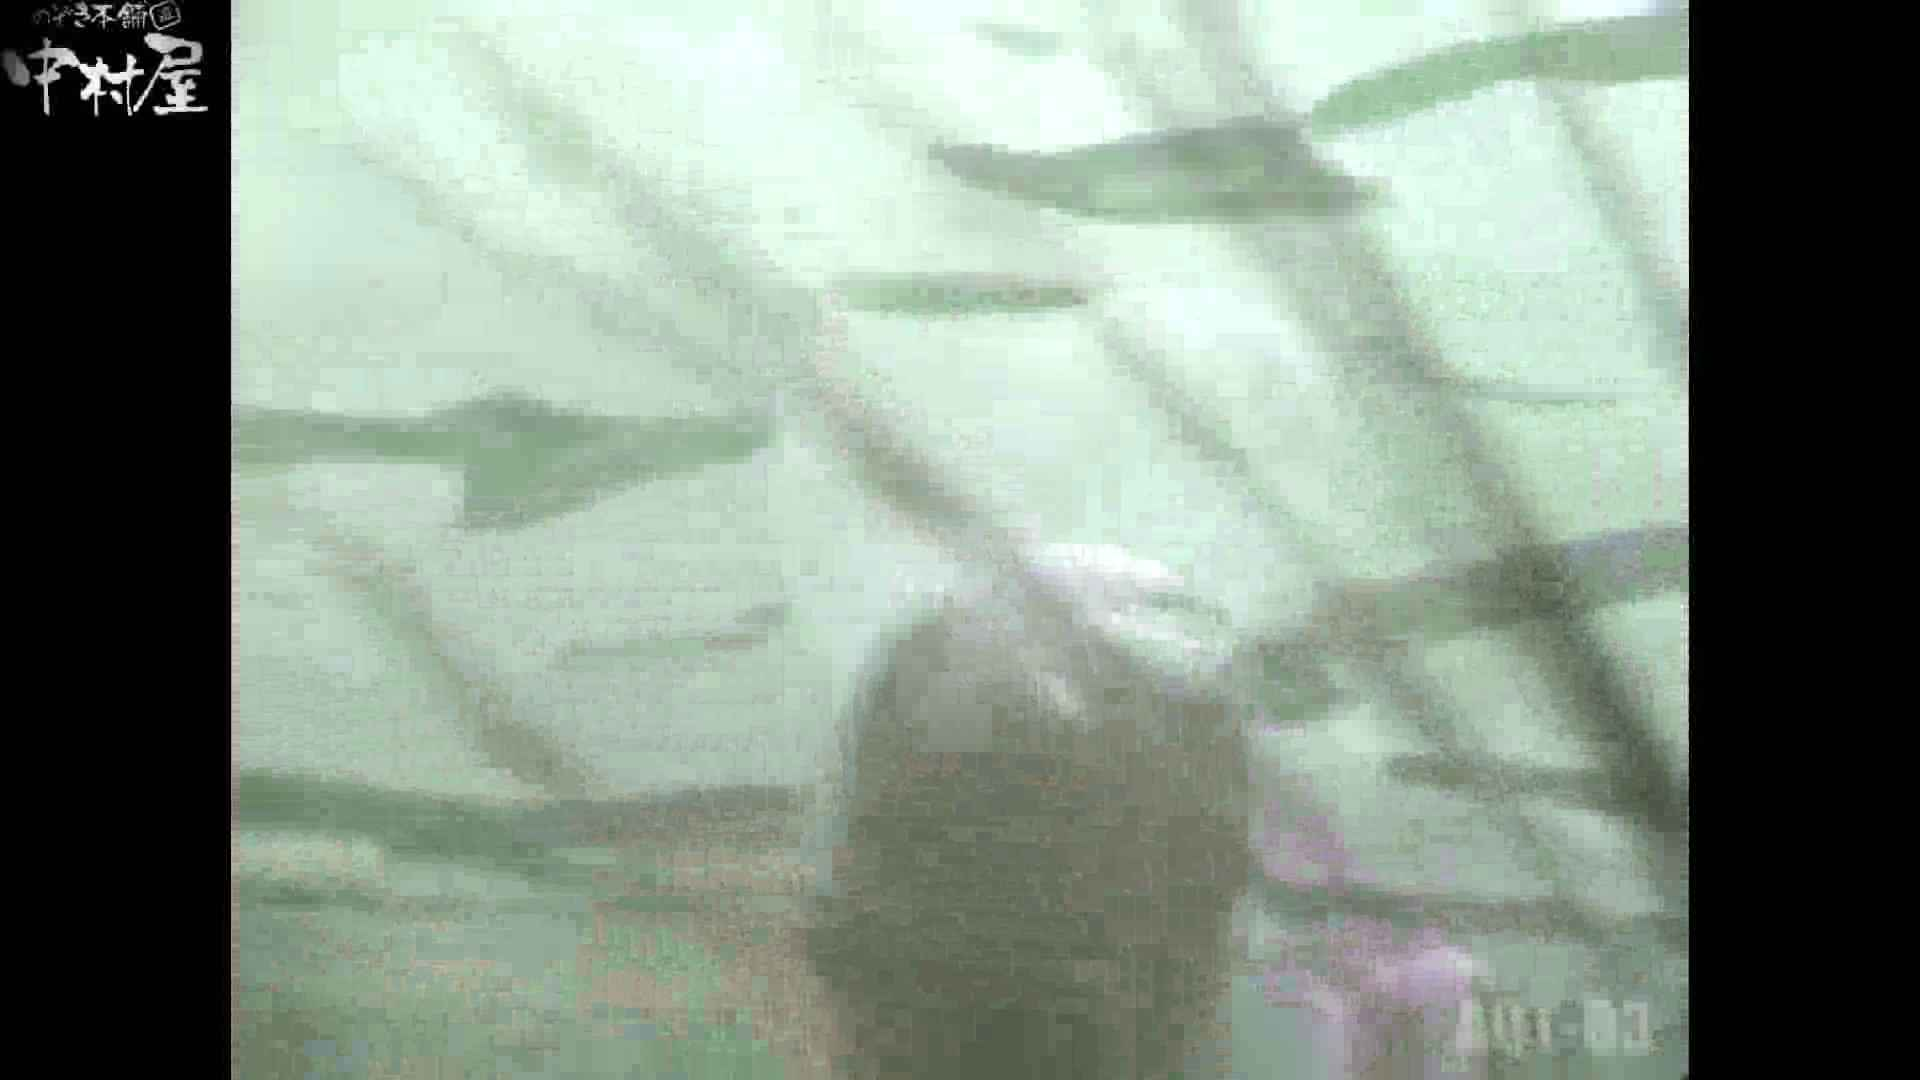 Aquaな露天風呂Vol.867潜入盗撮露天風呂参判湯 其の二 露天 SEX無修正画像 58画像 31